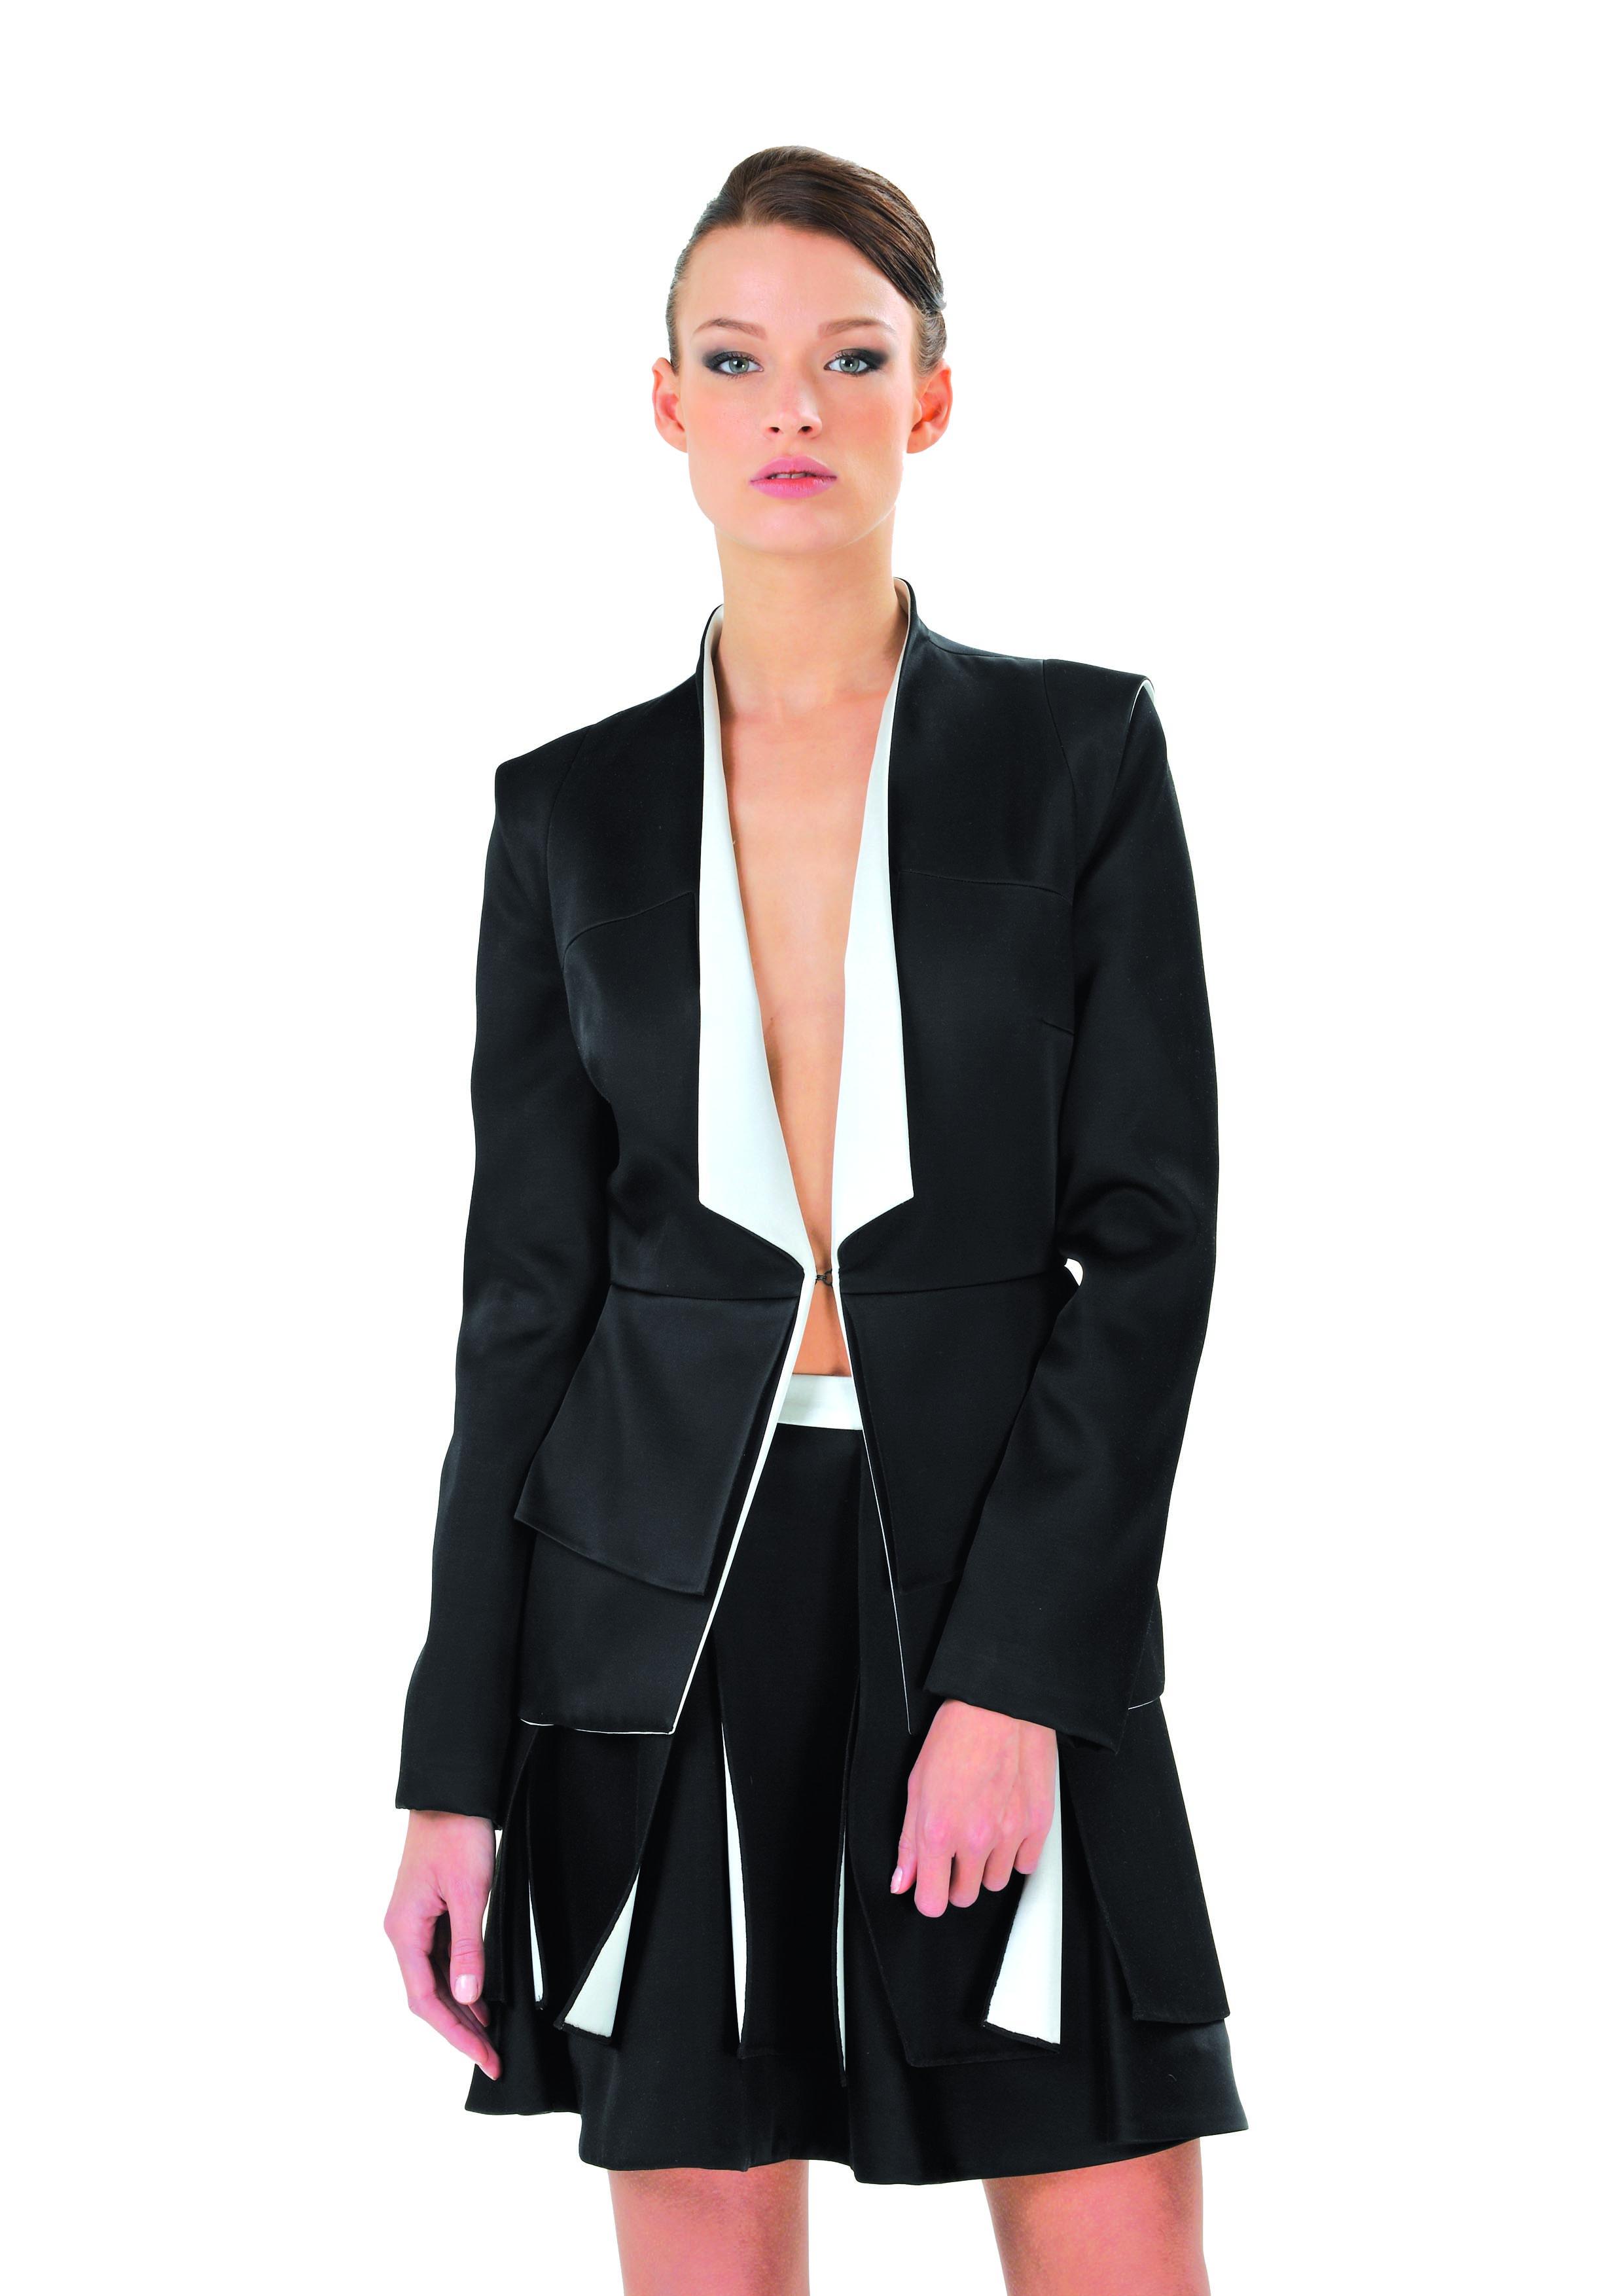 ANNARA Jacket & MAHINA Skirt